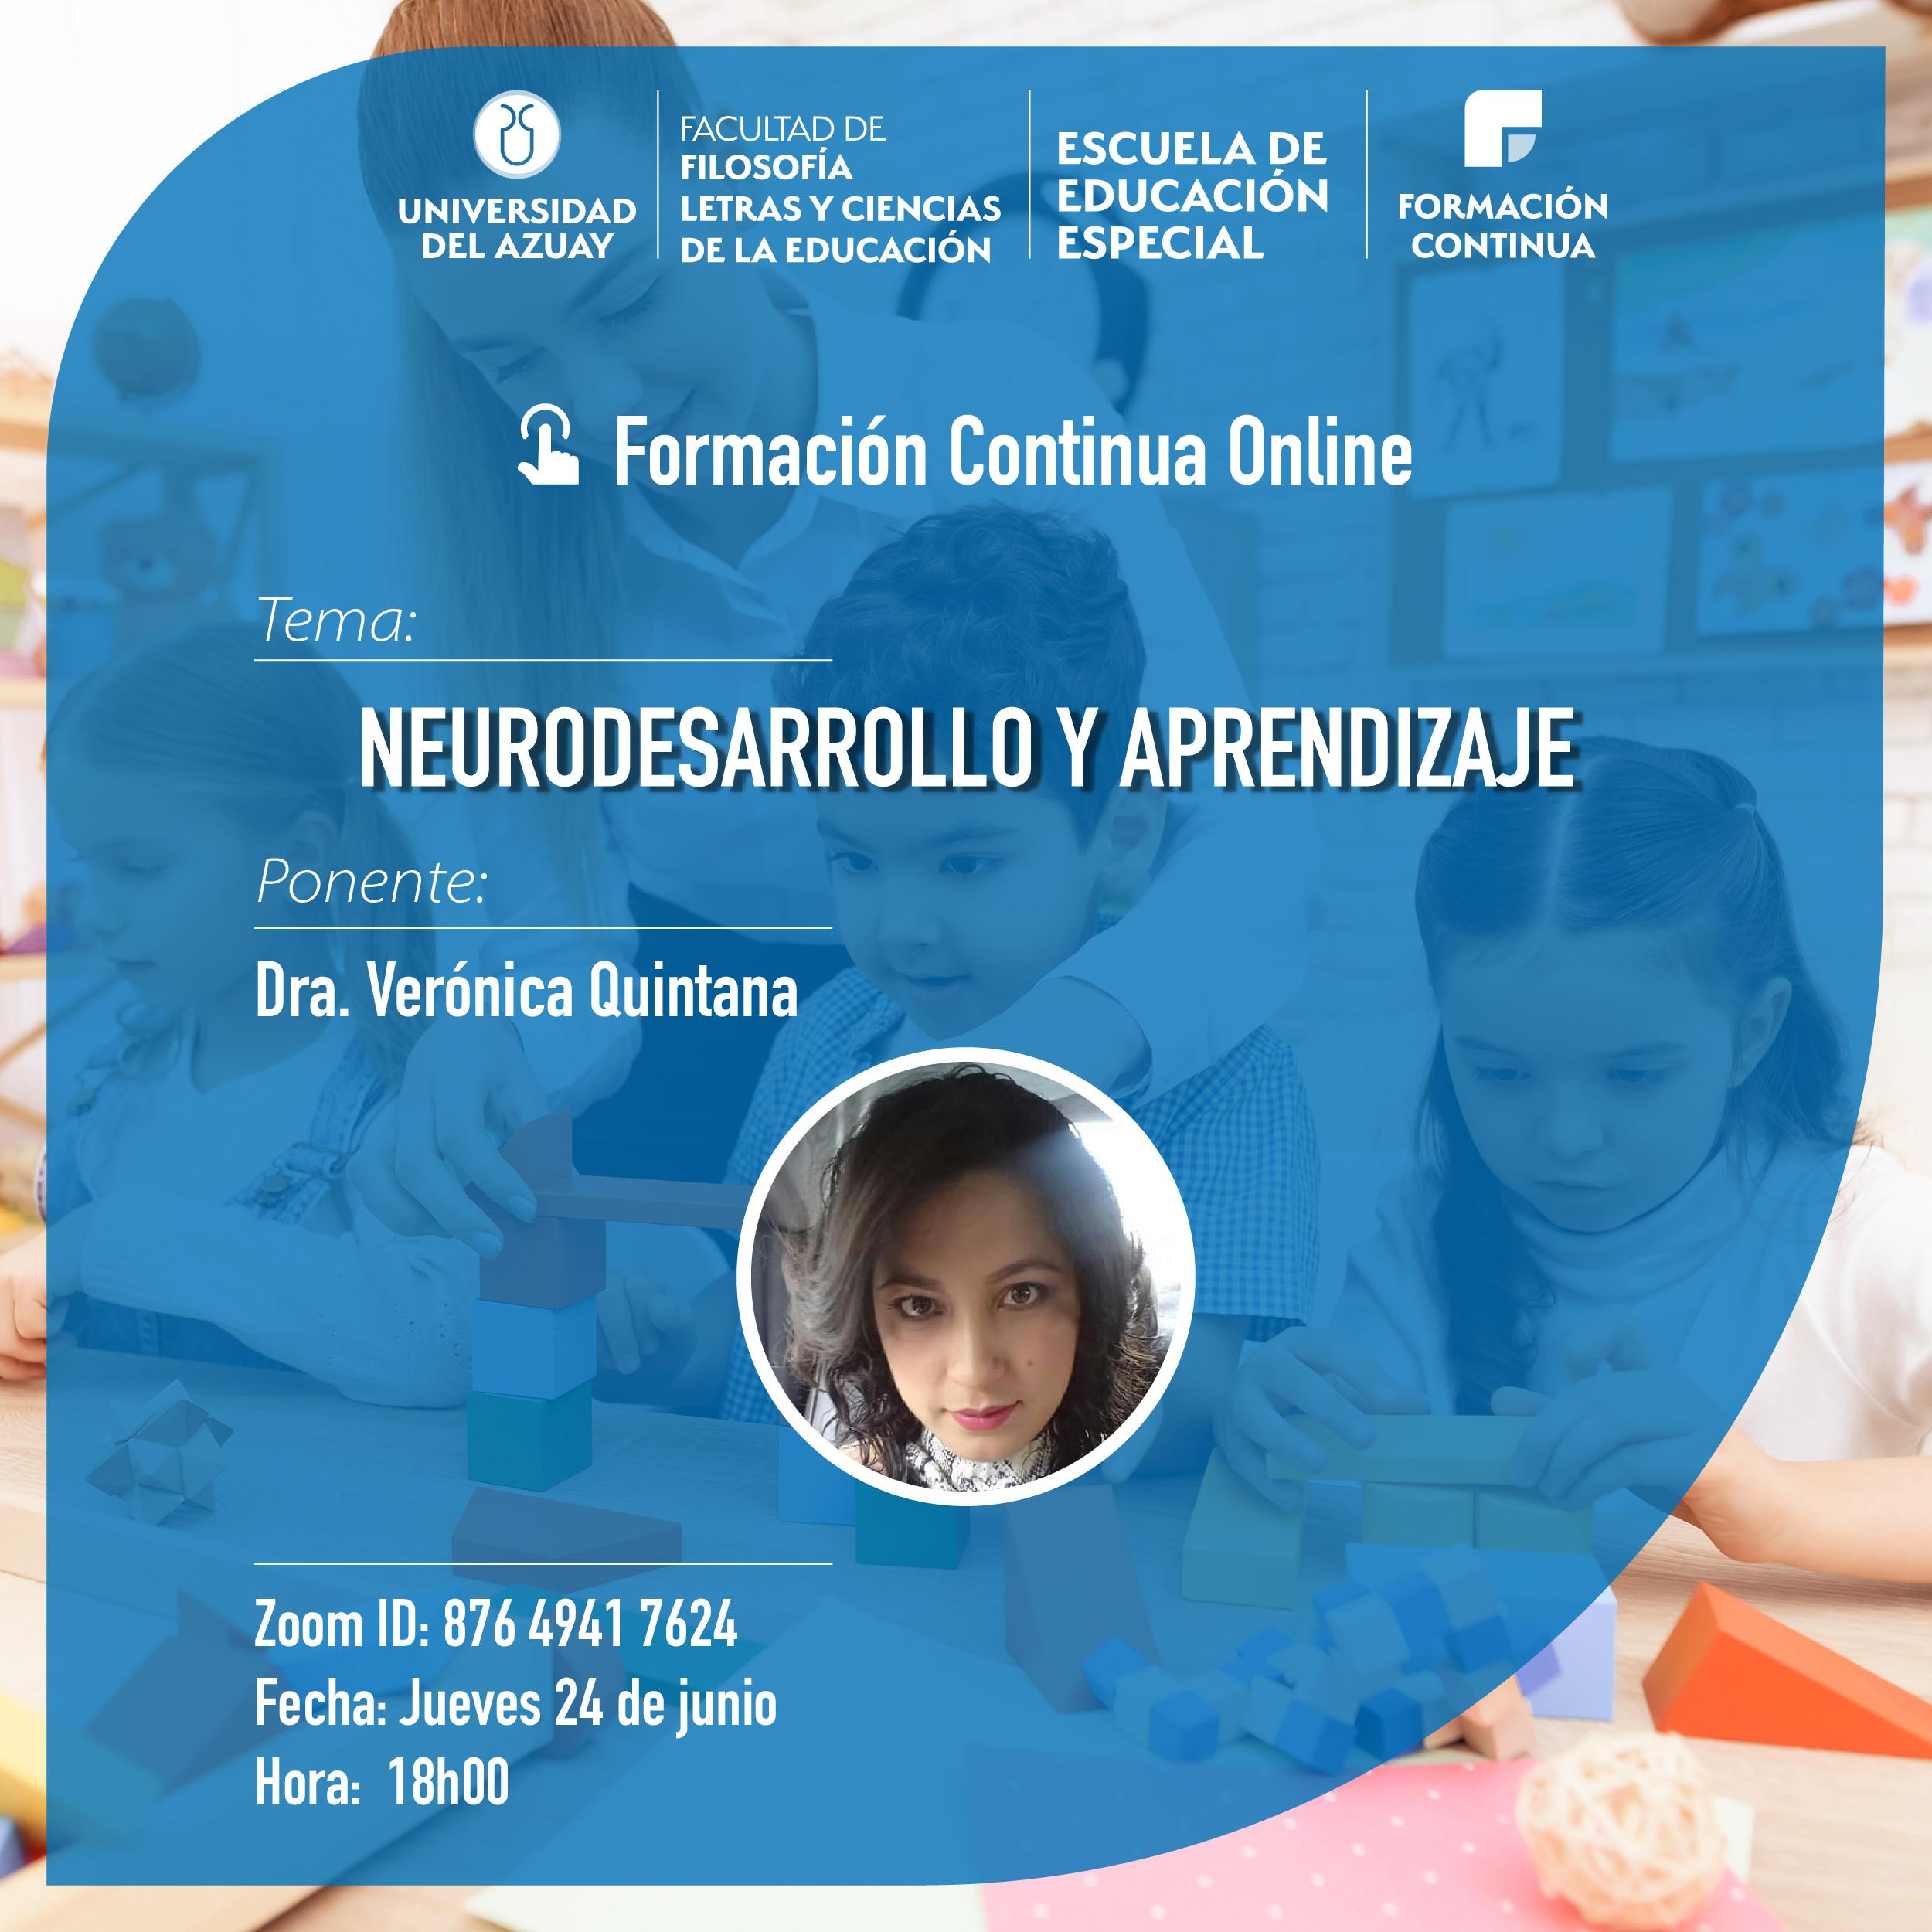 Neurodevelopment and Learning Webinar